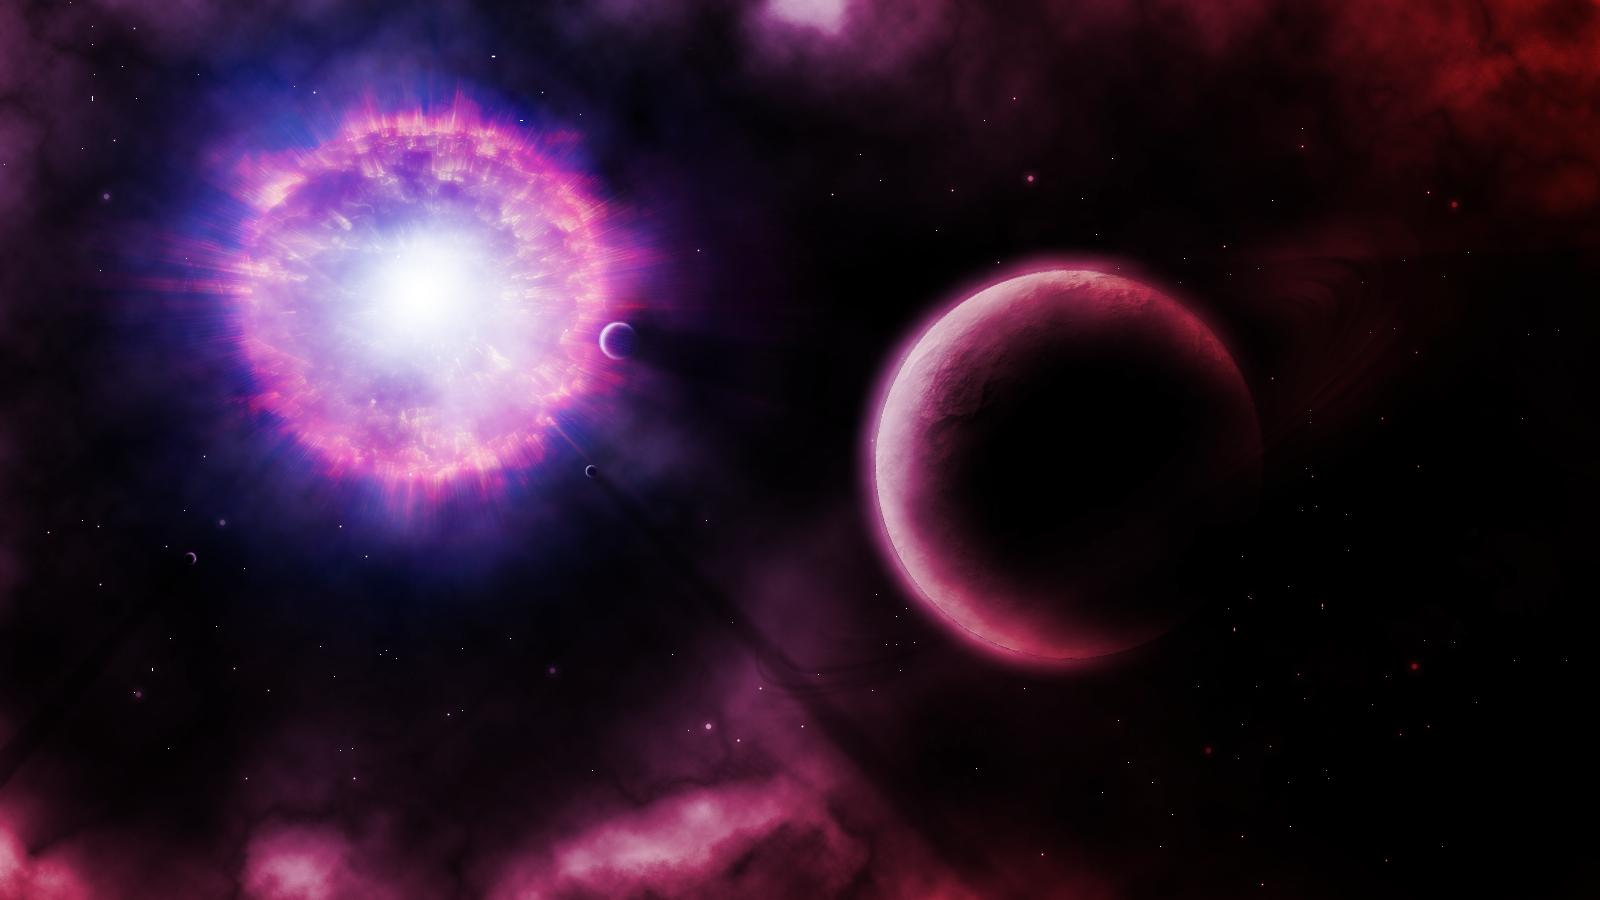 Supernova by Geoplex